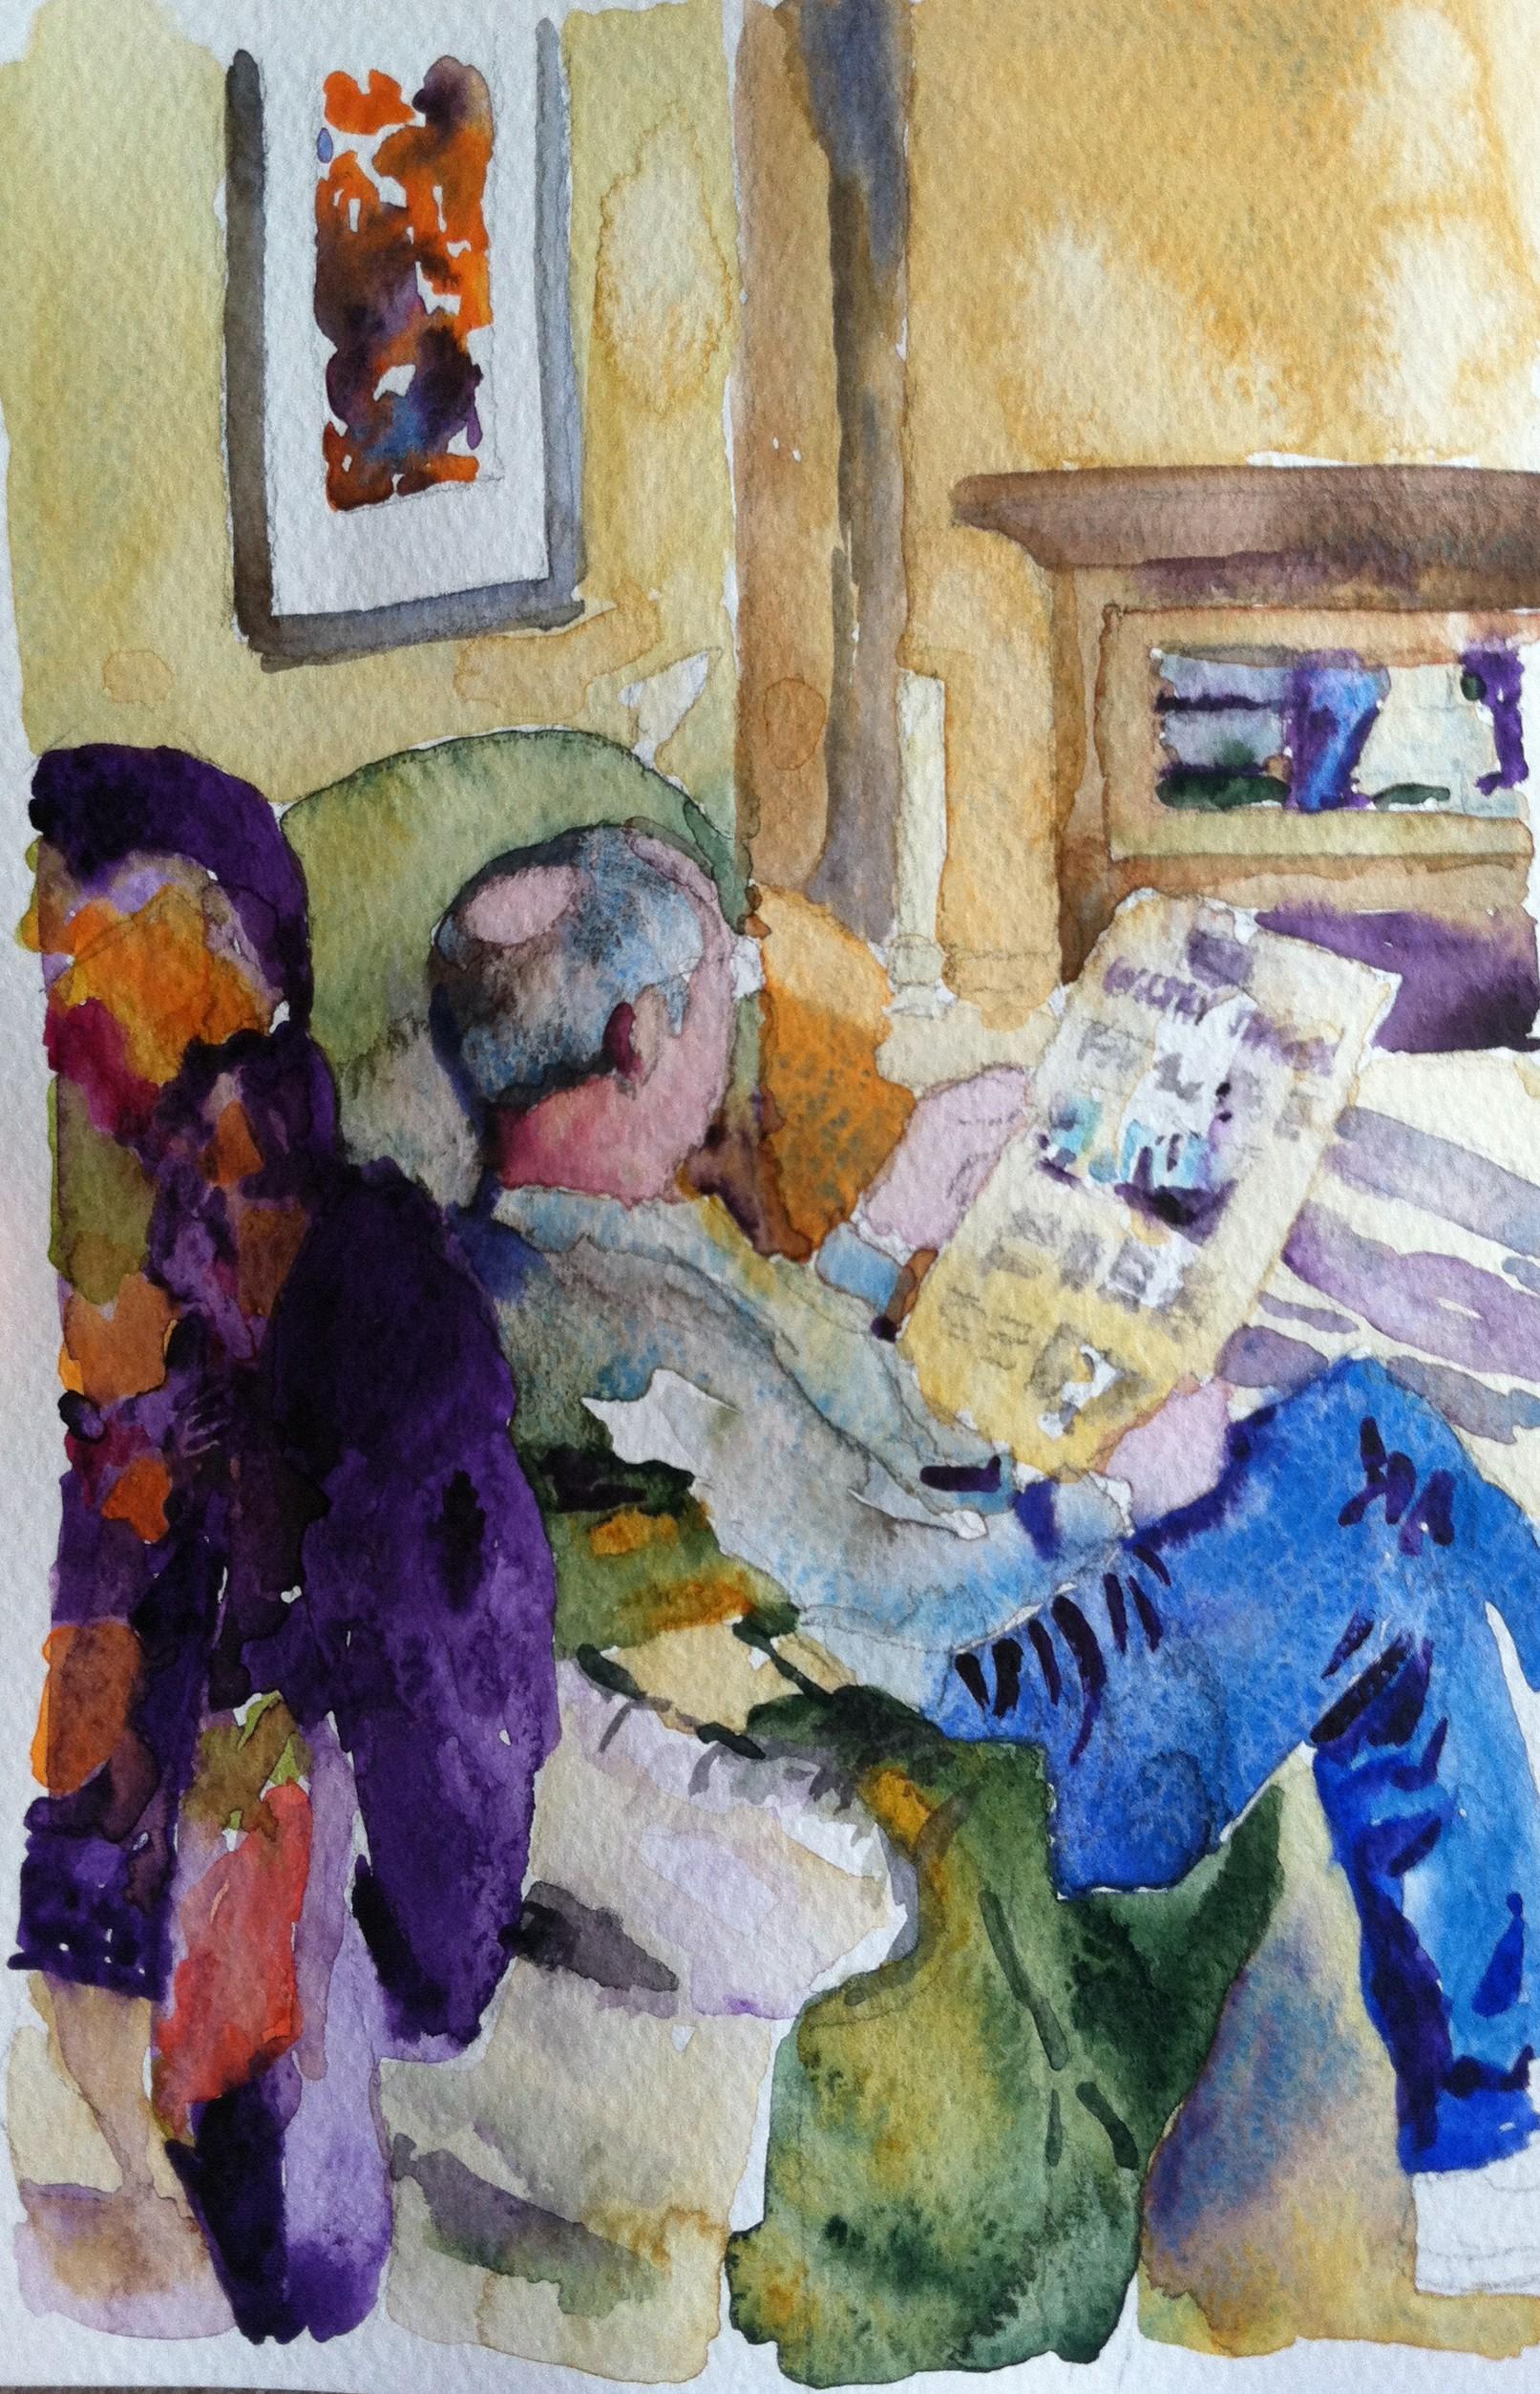 Watercolor art society houston tx - Morning Ritual 9 X 6 Watercolor Sketch Jan 23 2014